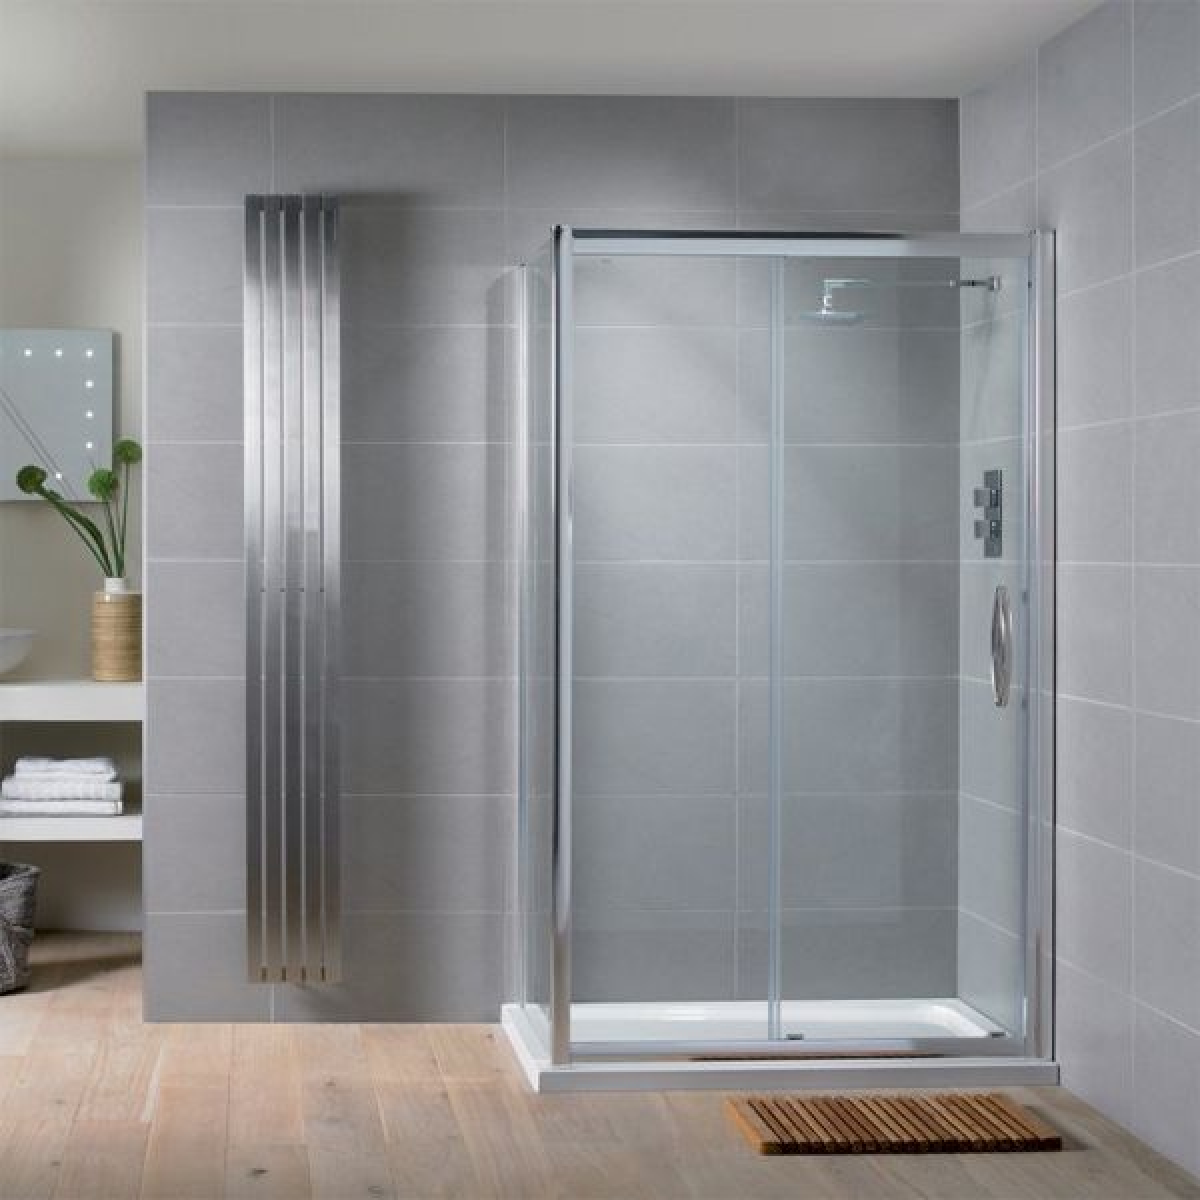 Aquadart Venturi 8 Sliding Shower Door with Optional Side Panel